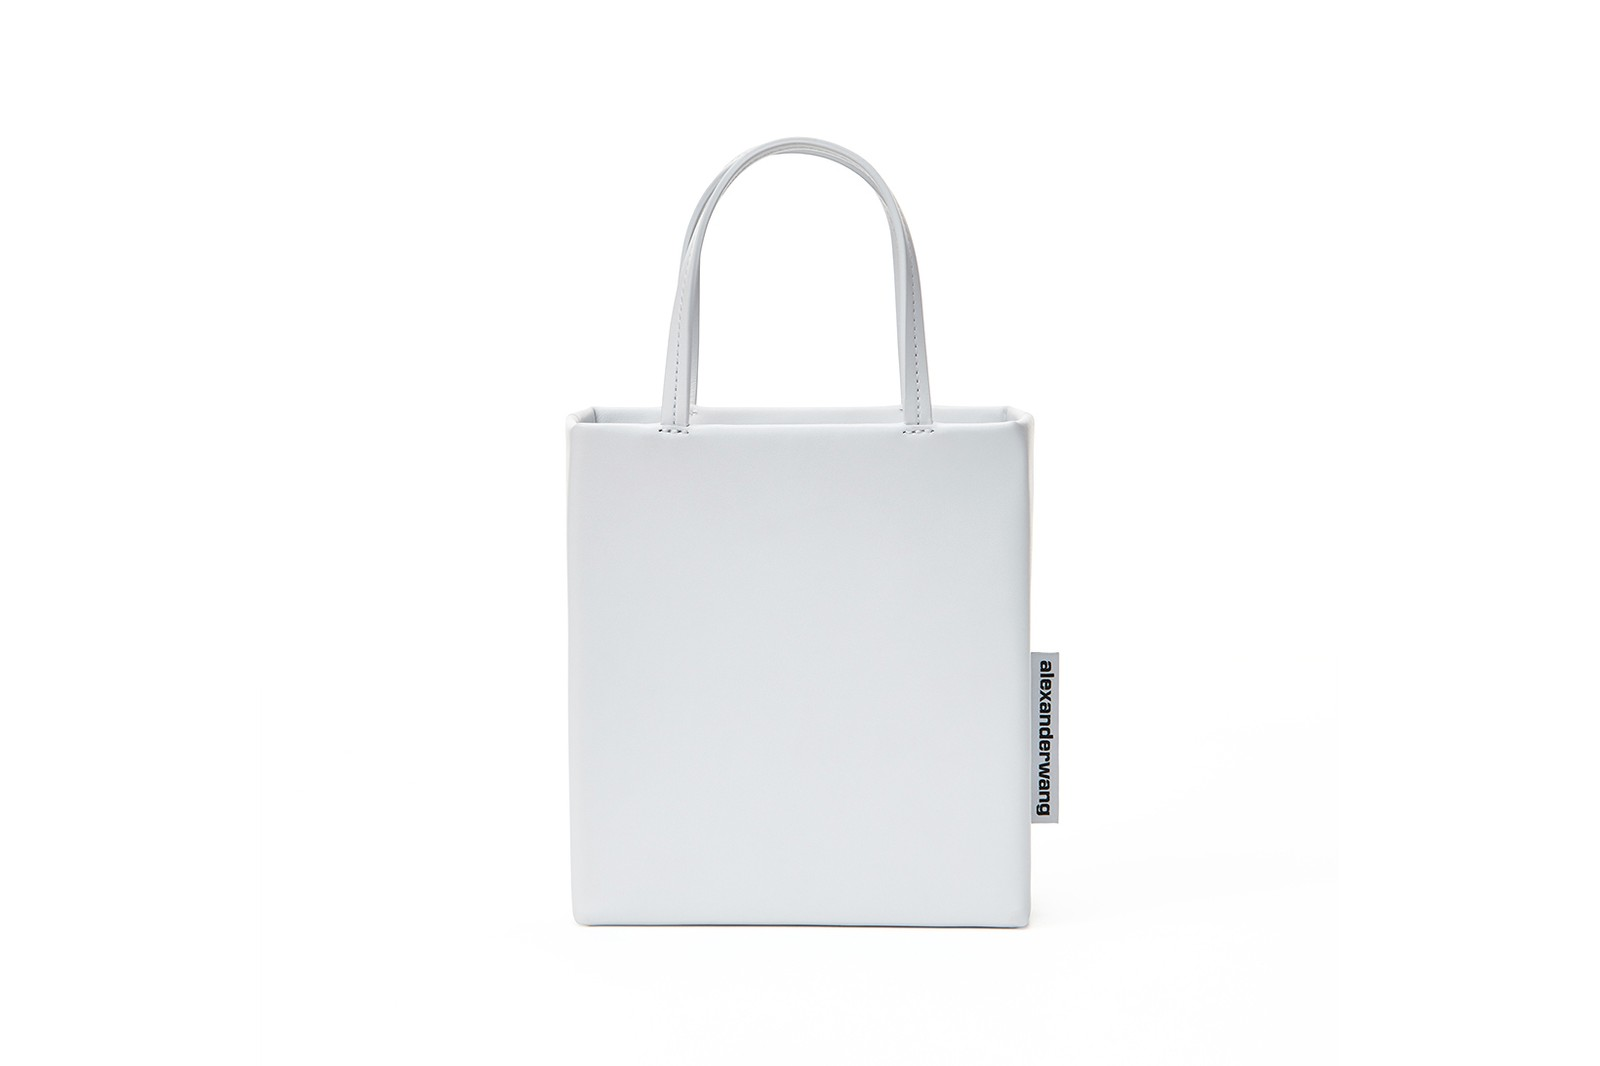 alexander wang she e o handbag bags rickey thompson infomercial campaign designer shopper mini classic black red white